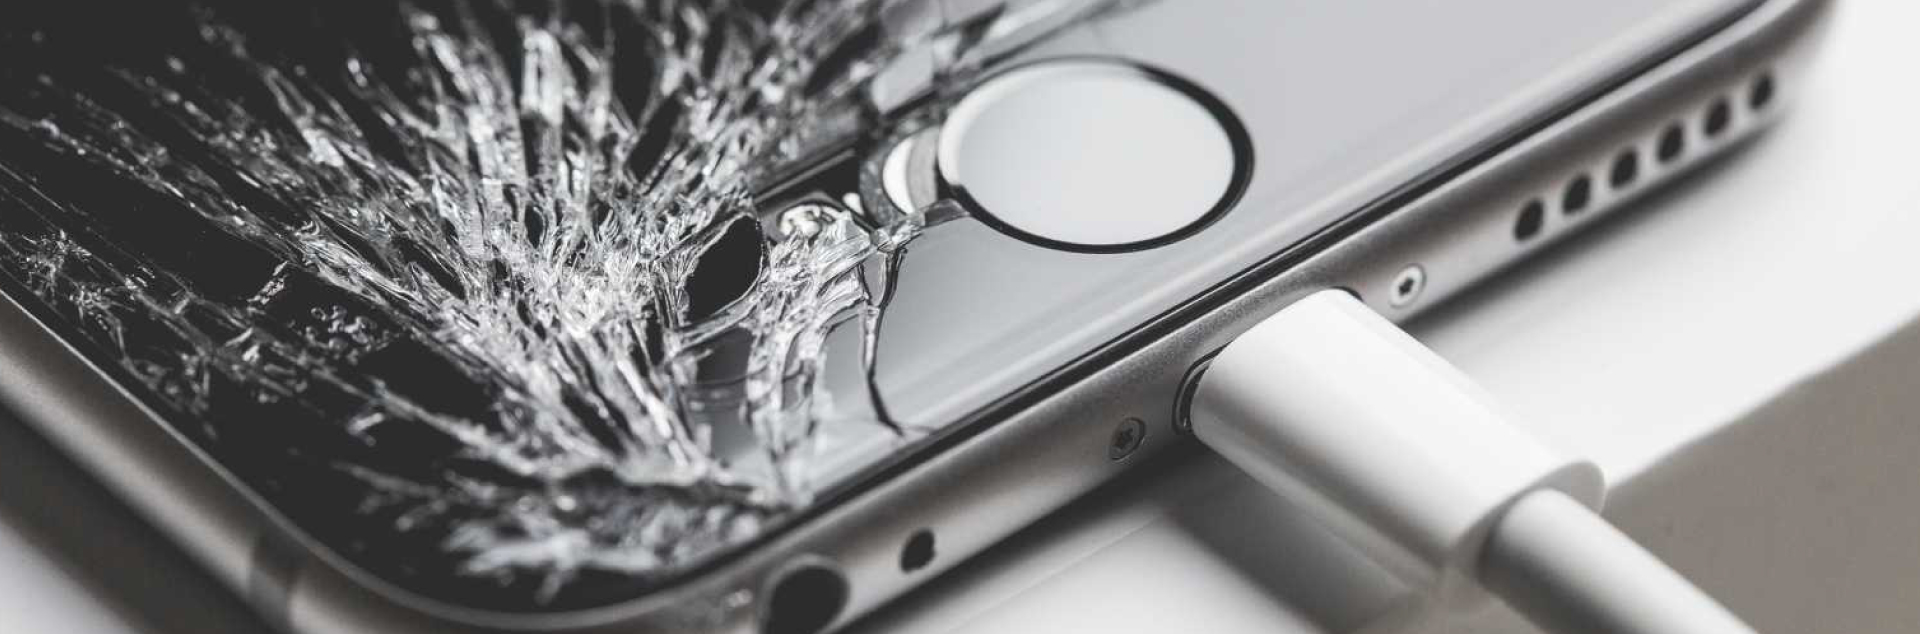 iPhone修理の正規店と非正規店の違い!iPhone修理店の選び方